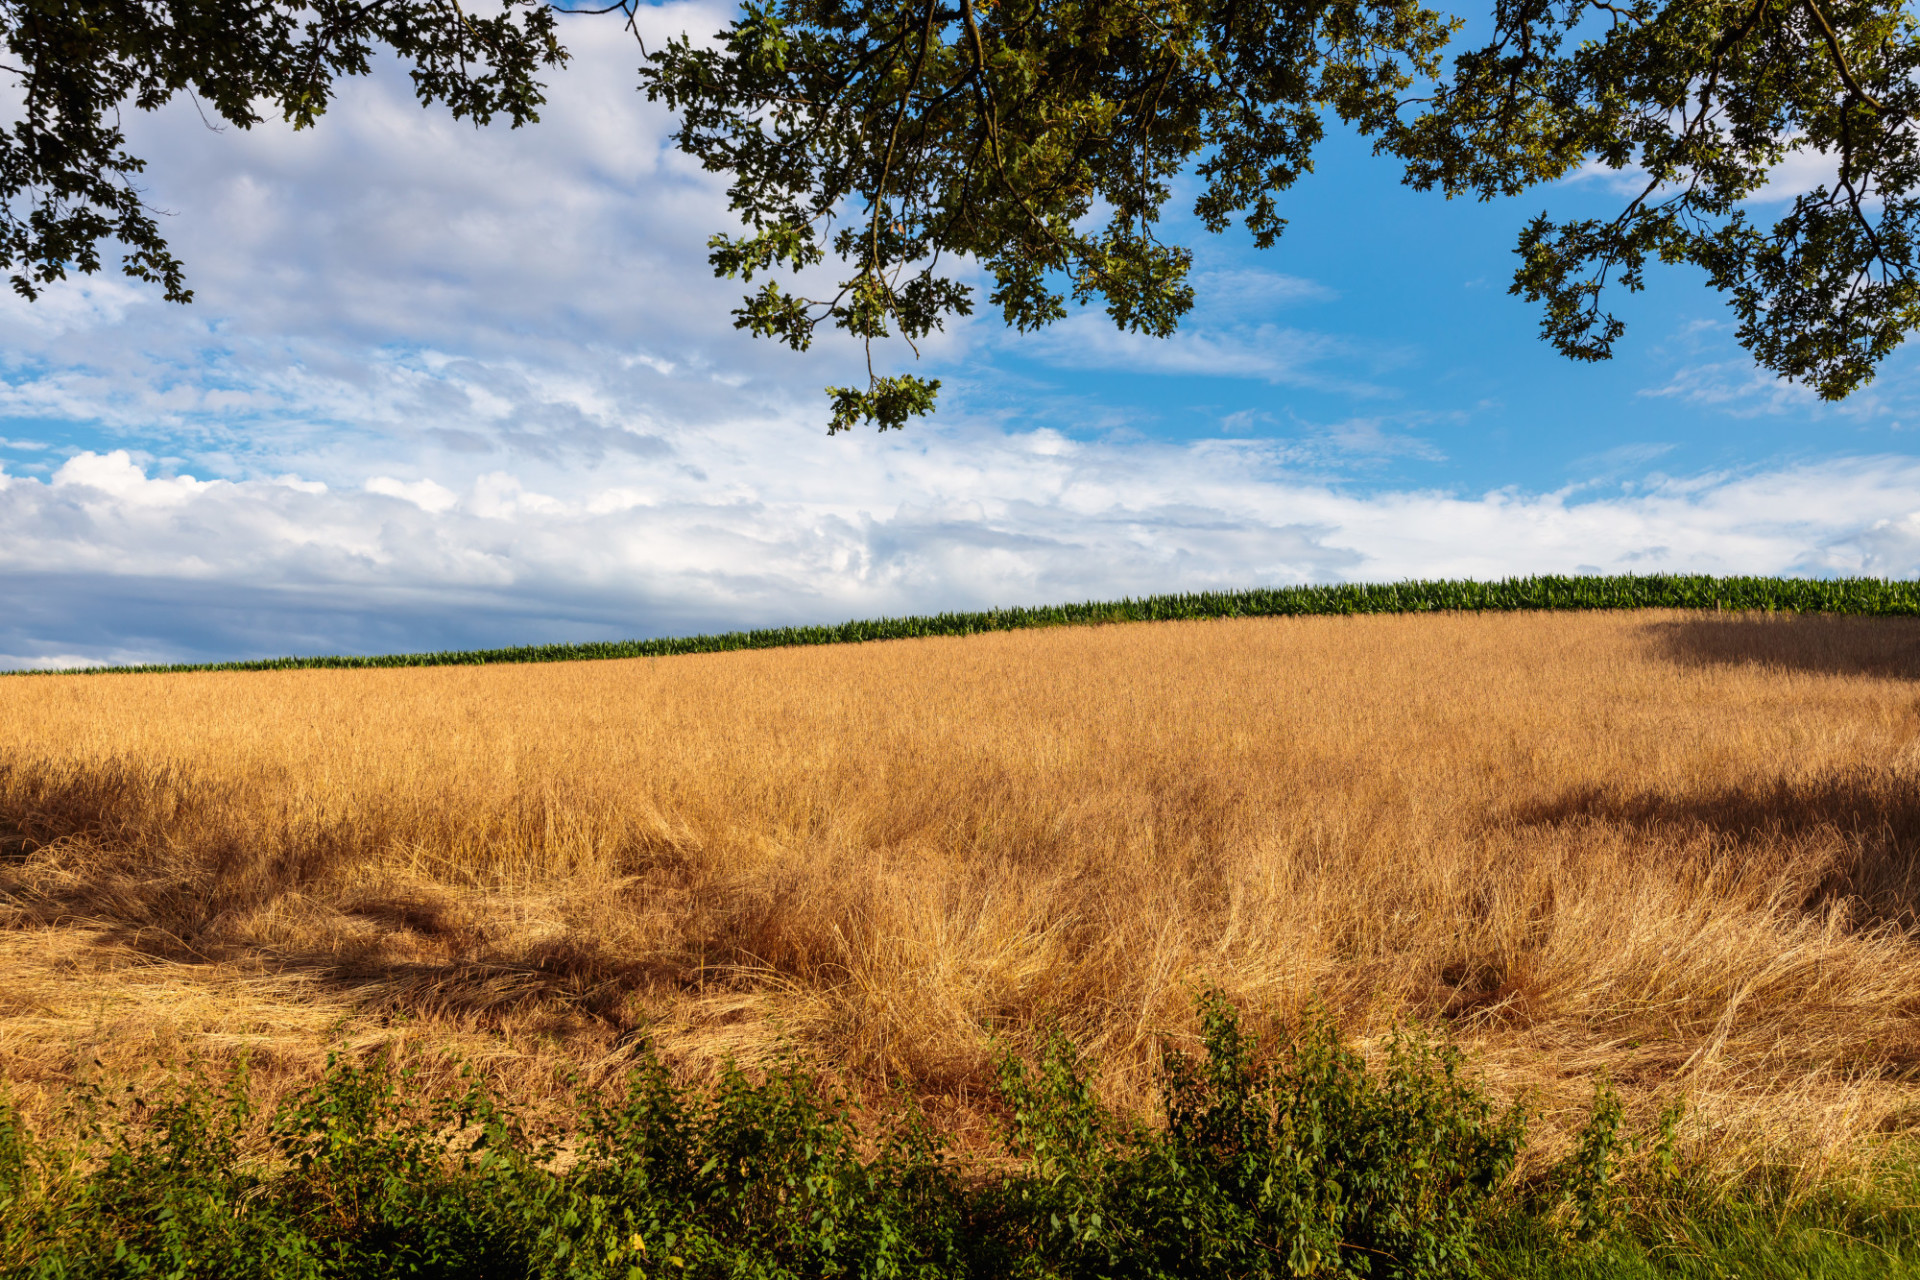 Beautiful rural landscape in europe